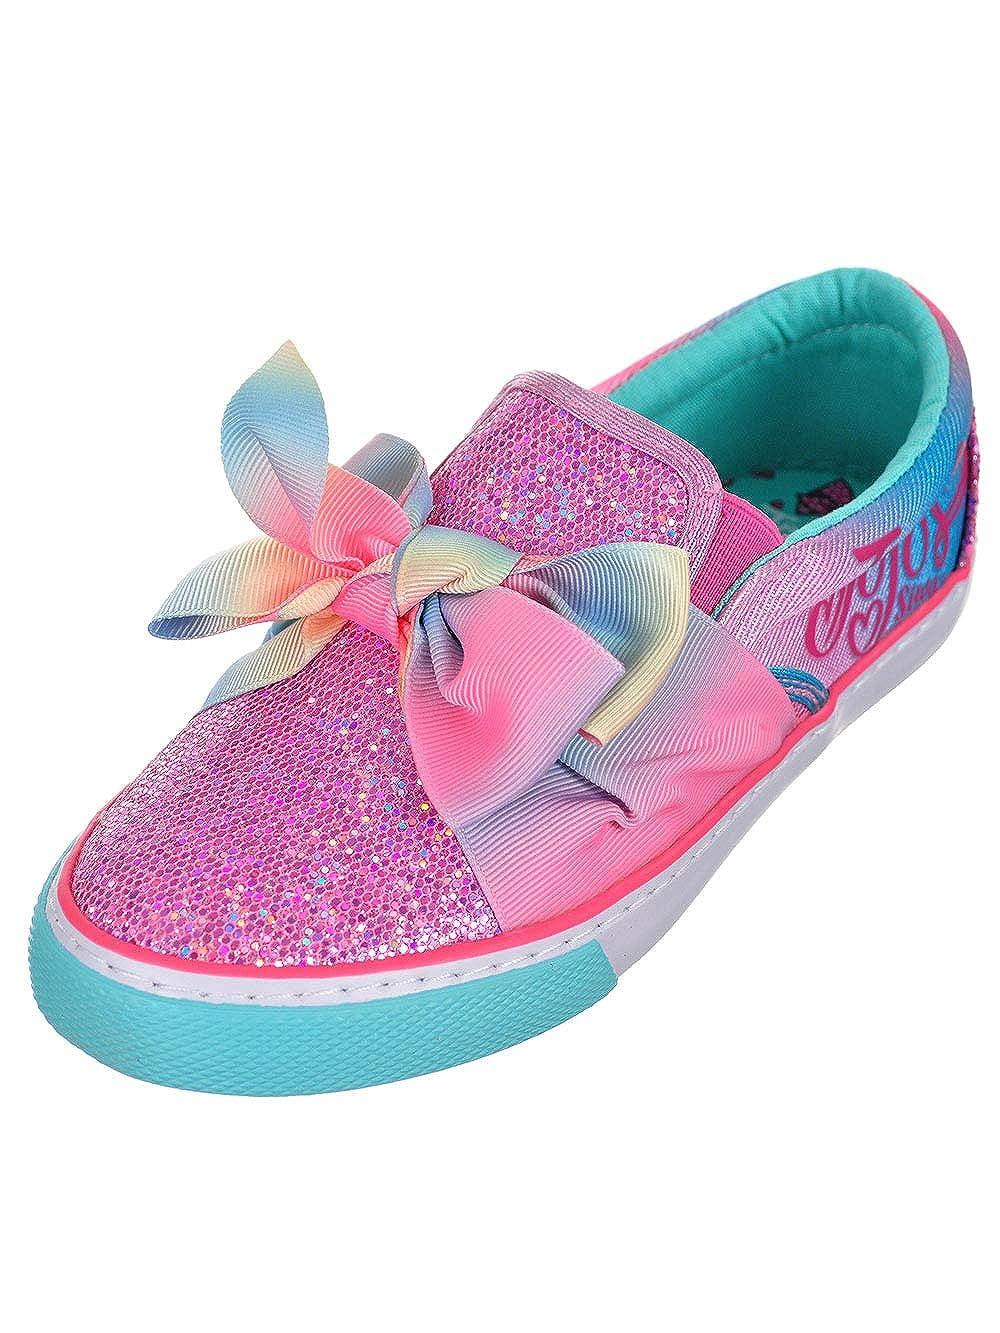 Josmo Kids Womens JoJo Siwa Slip-on Sneaker (Little Kid/Big Kid)